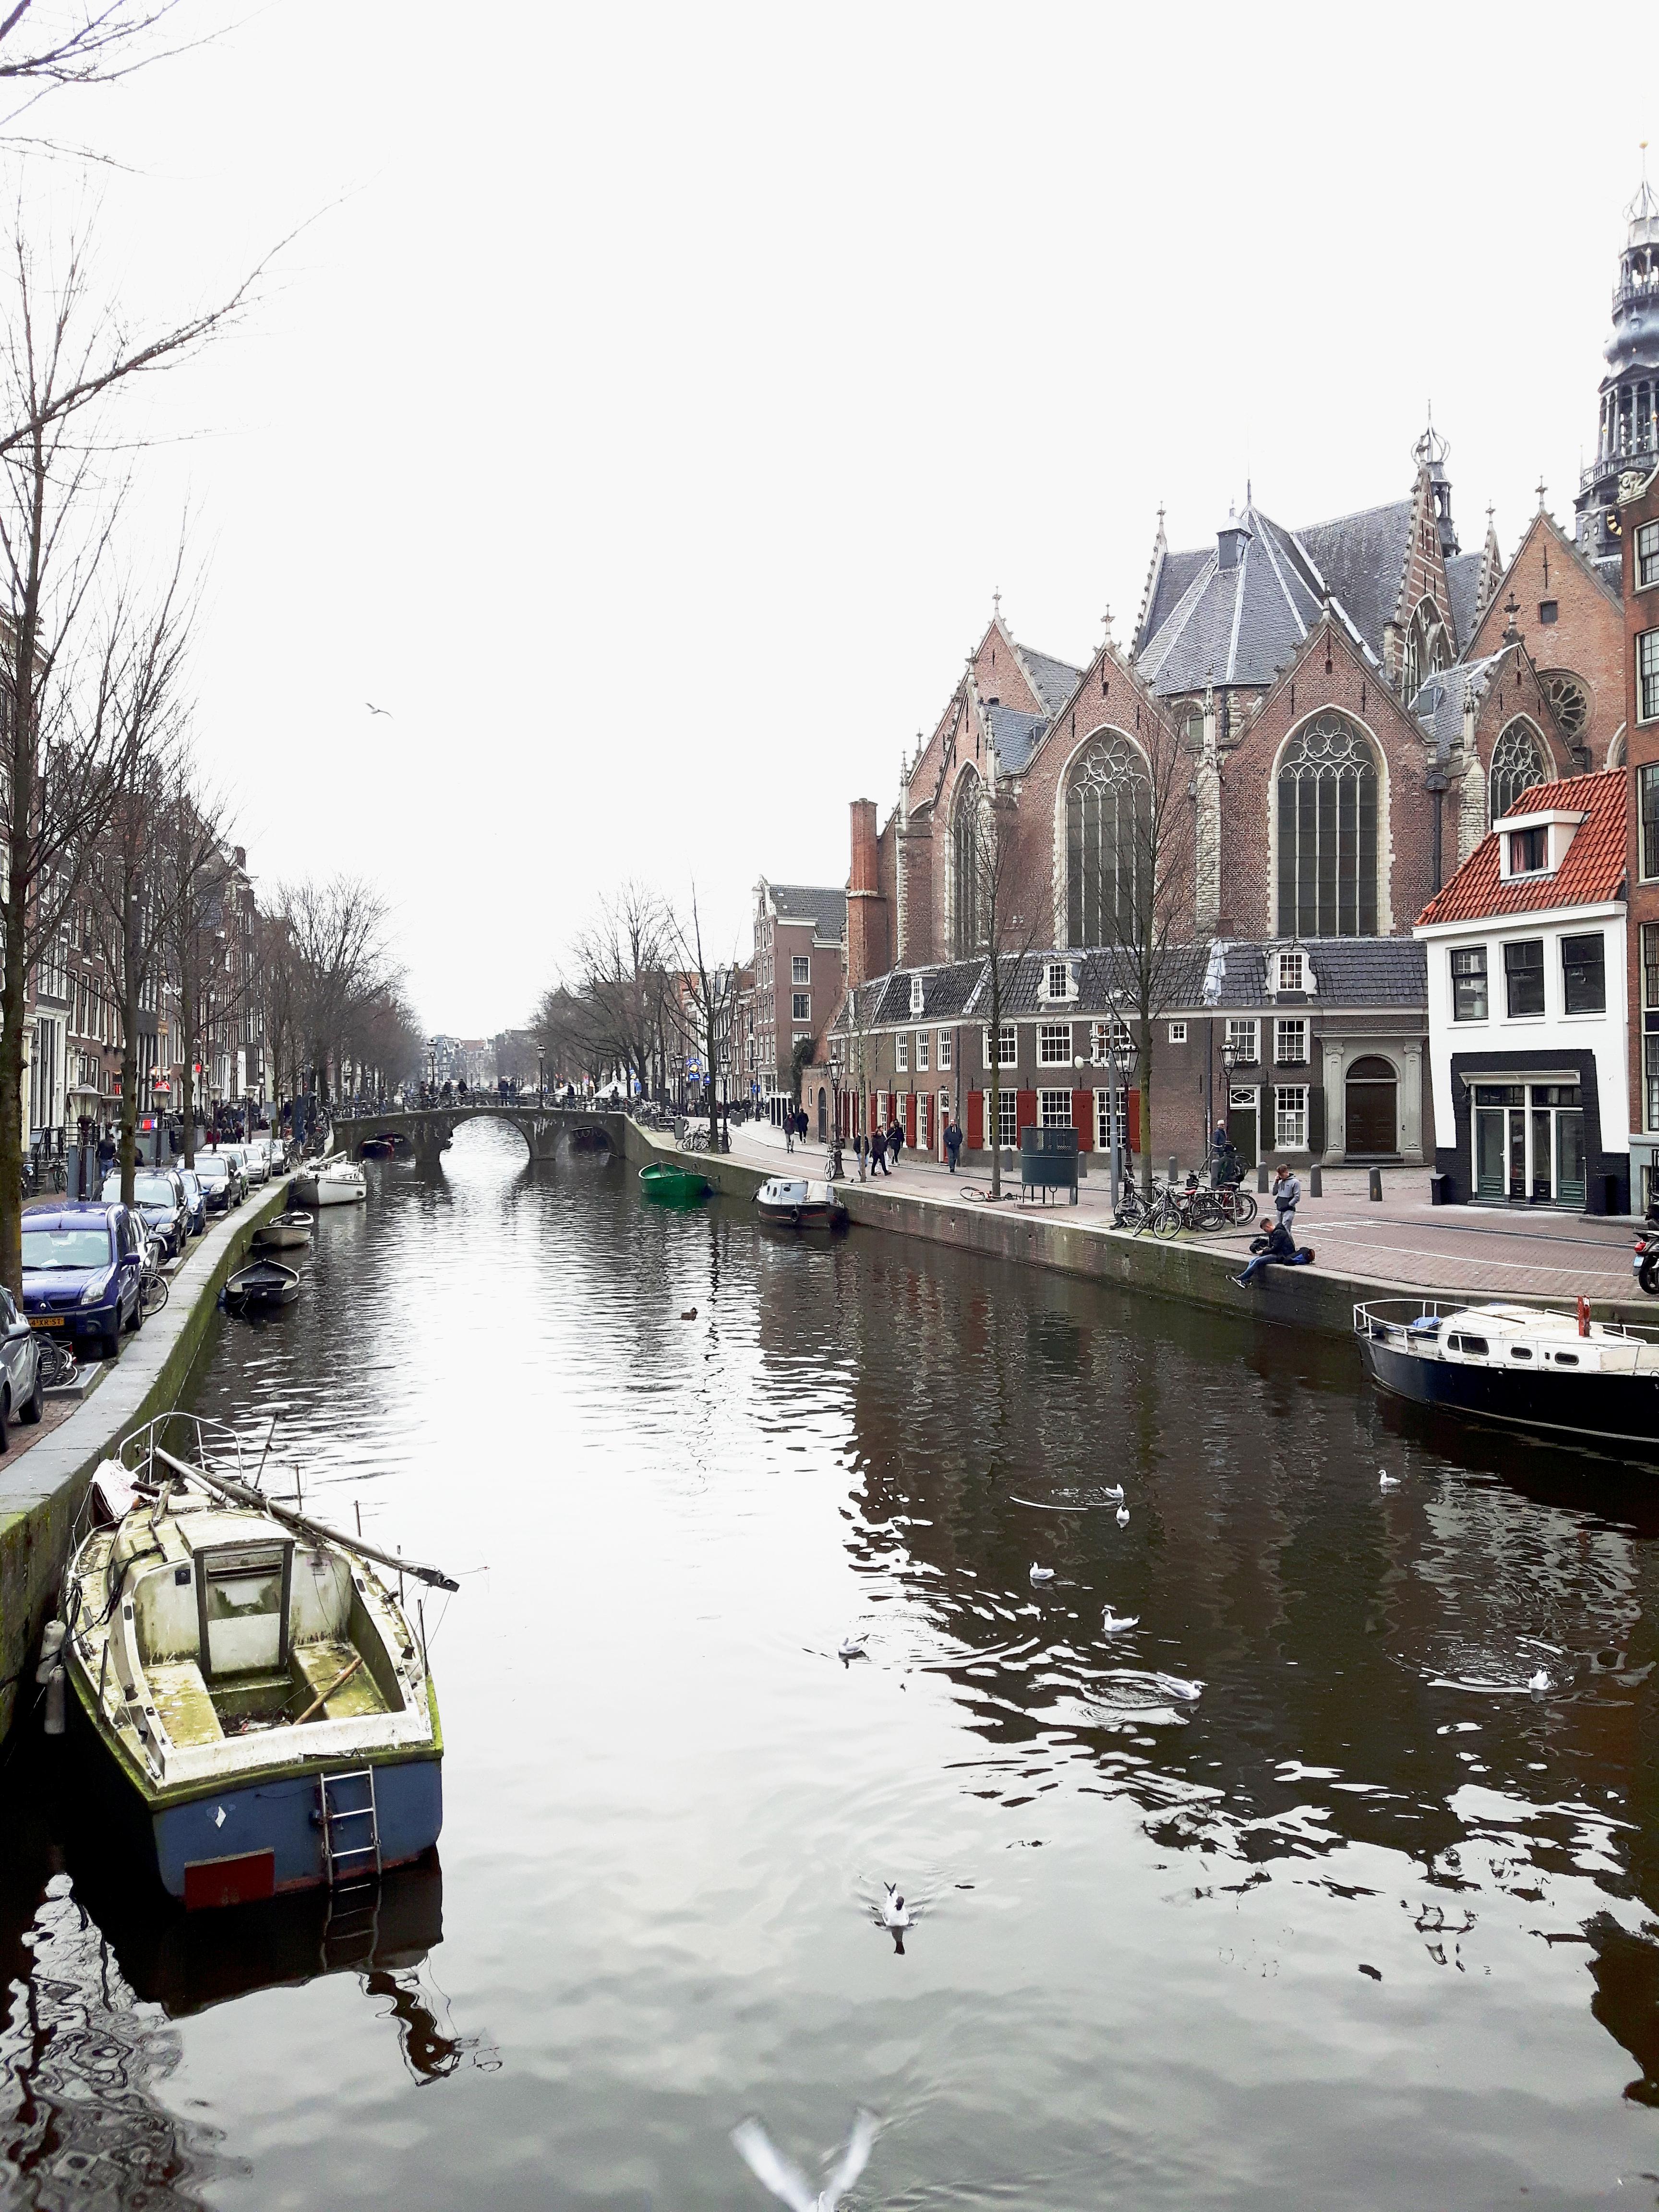 Oude_Kerk_Oude_Zijde_Amsterdam_Netherlands